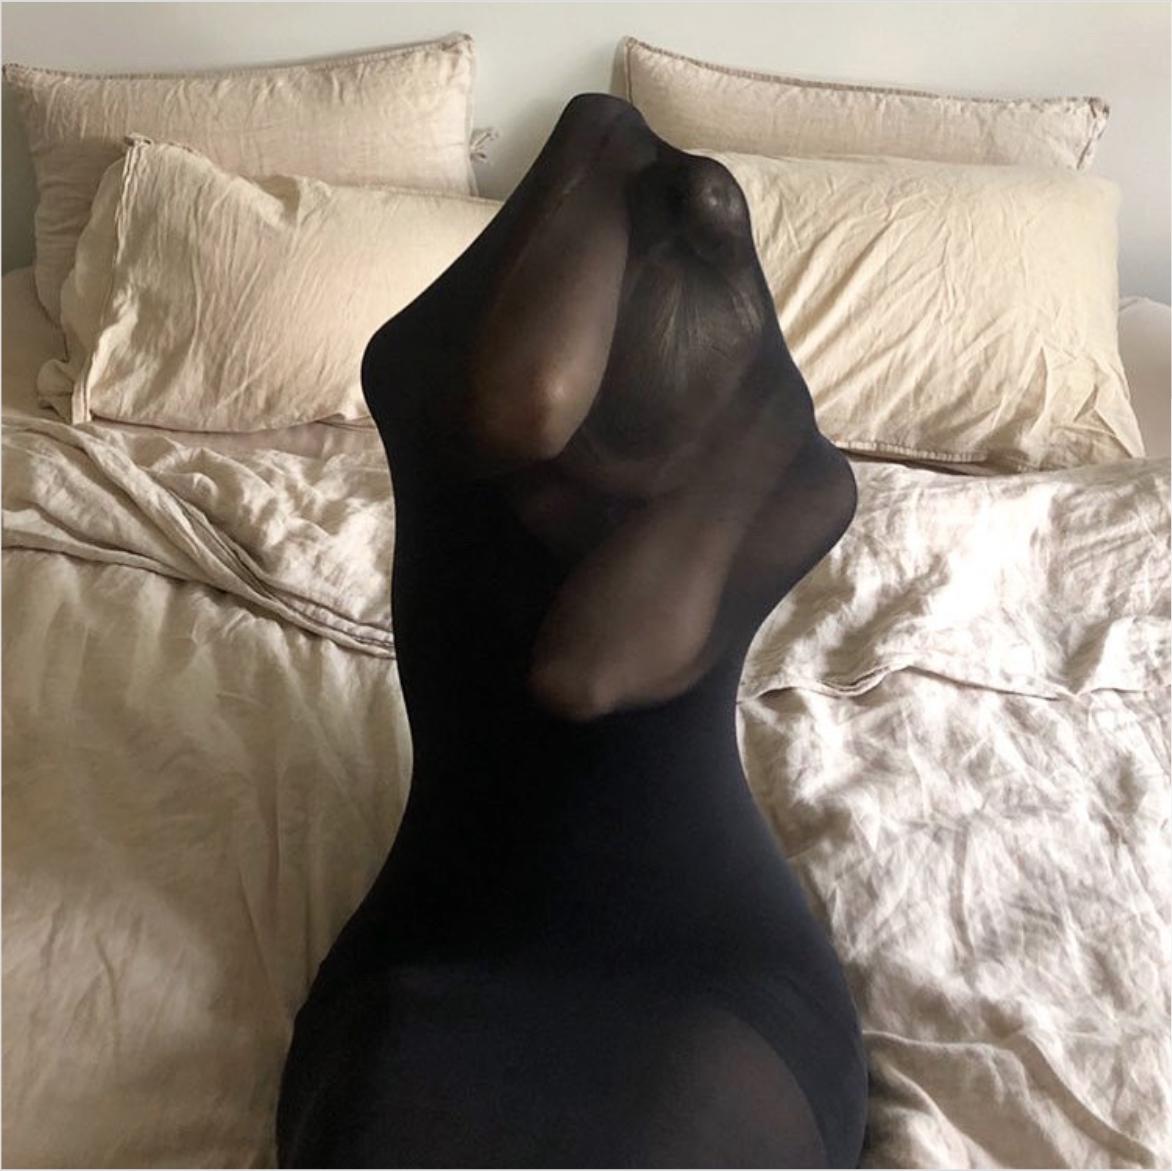 Siluett av kvinne i skulpturell form